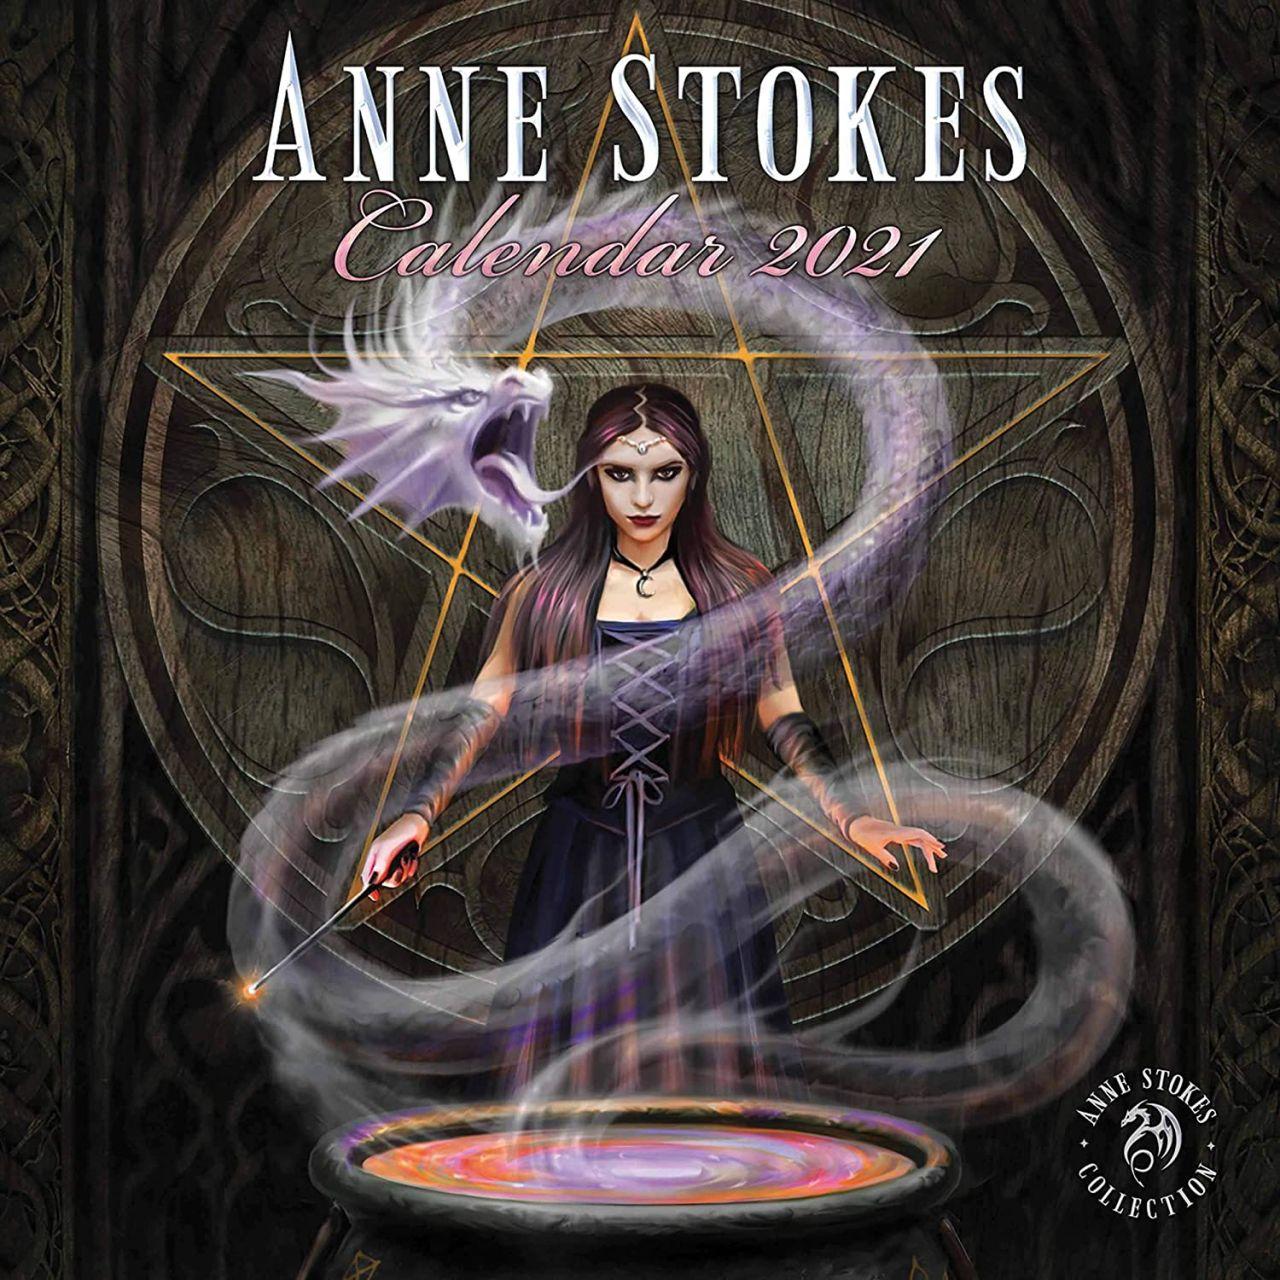 Anne Stokes Calendar 2021 - Fantasy